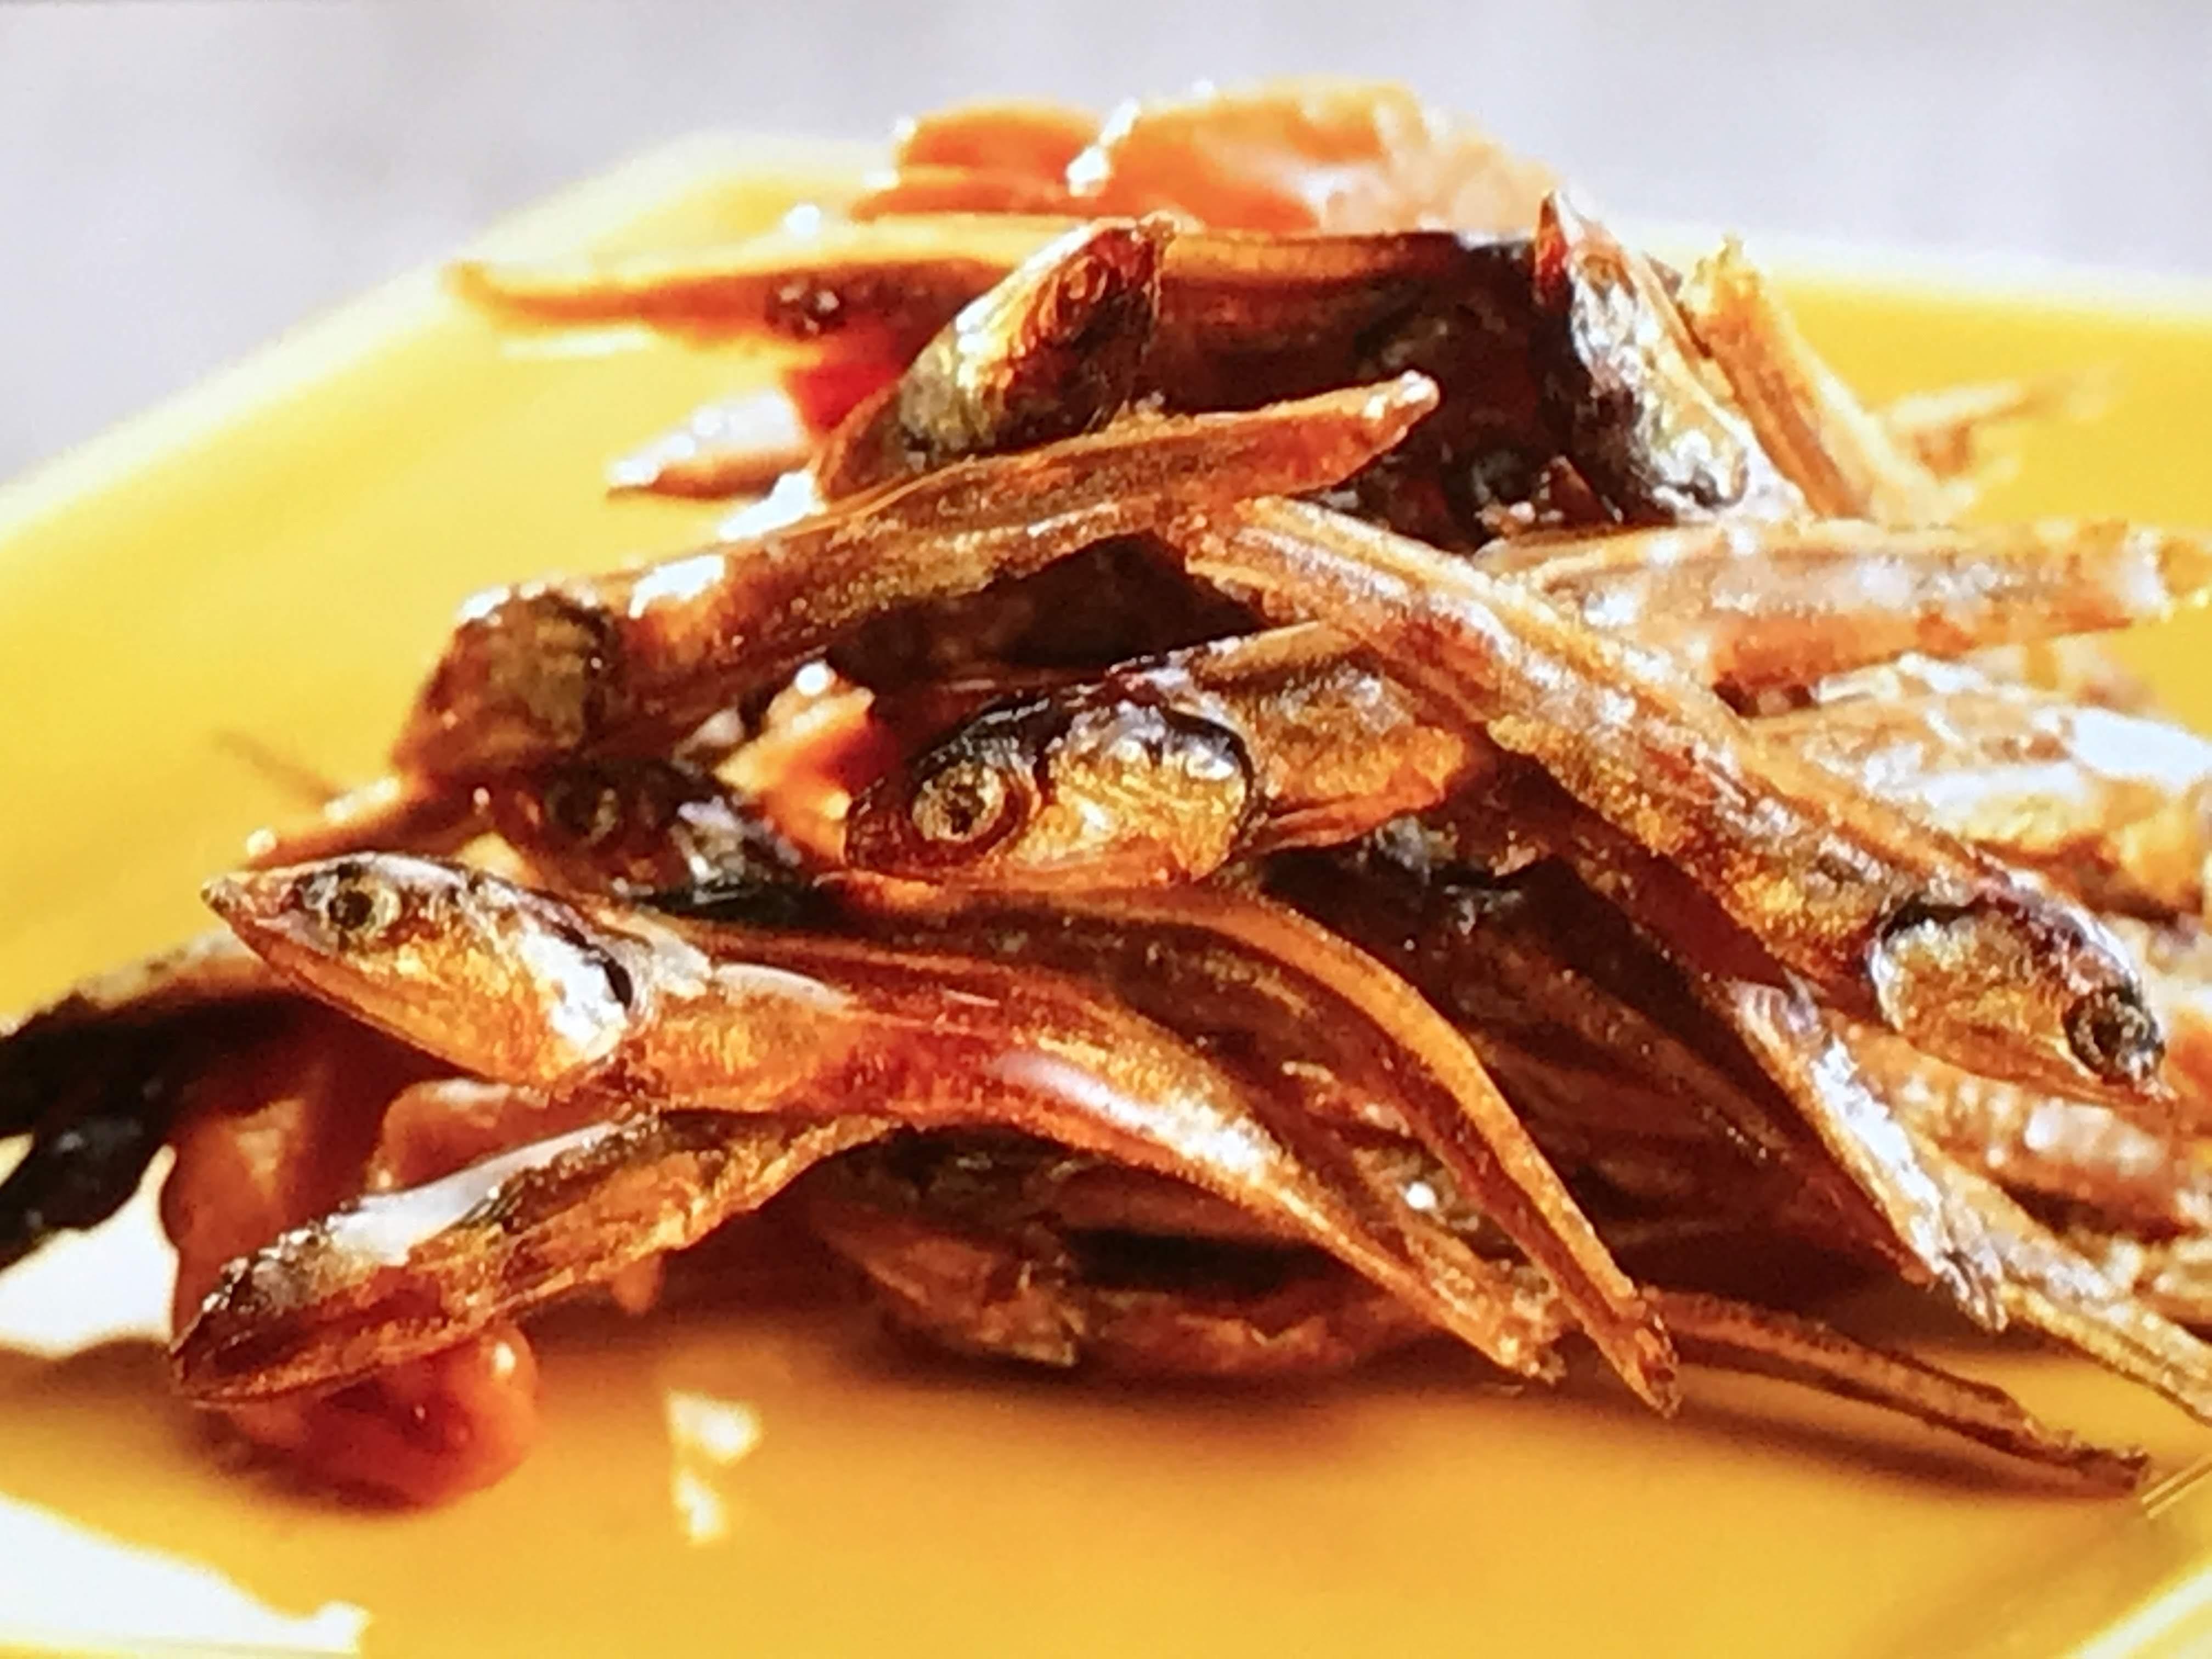 NHKきょうの料理は揚げごまめ・数の子・黒豆レシピ!柳原一成の